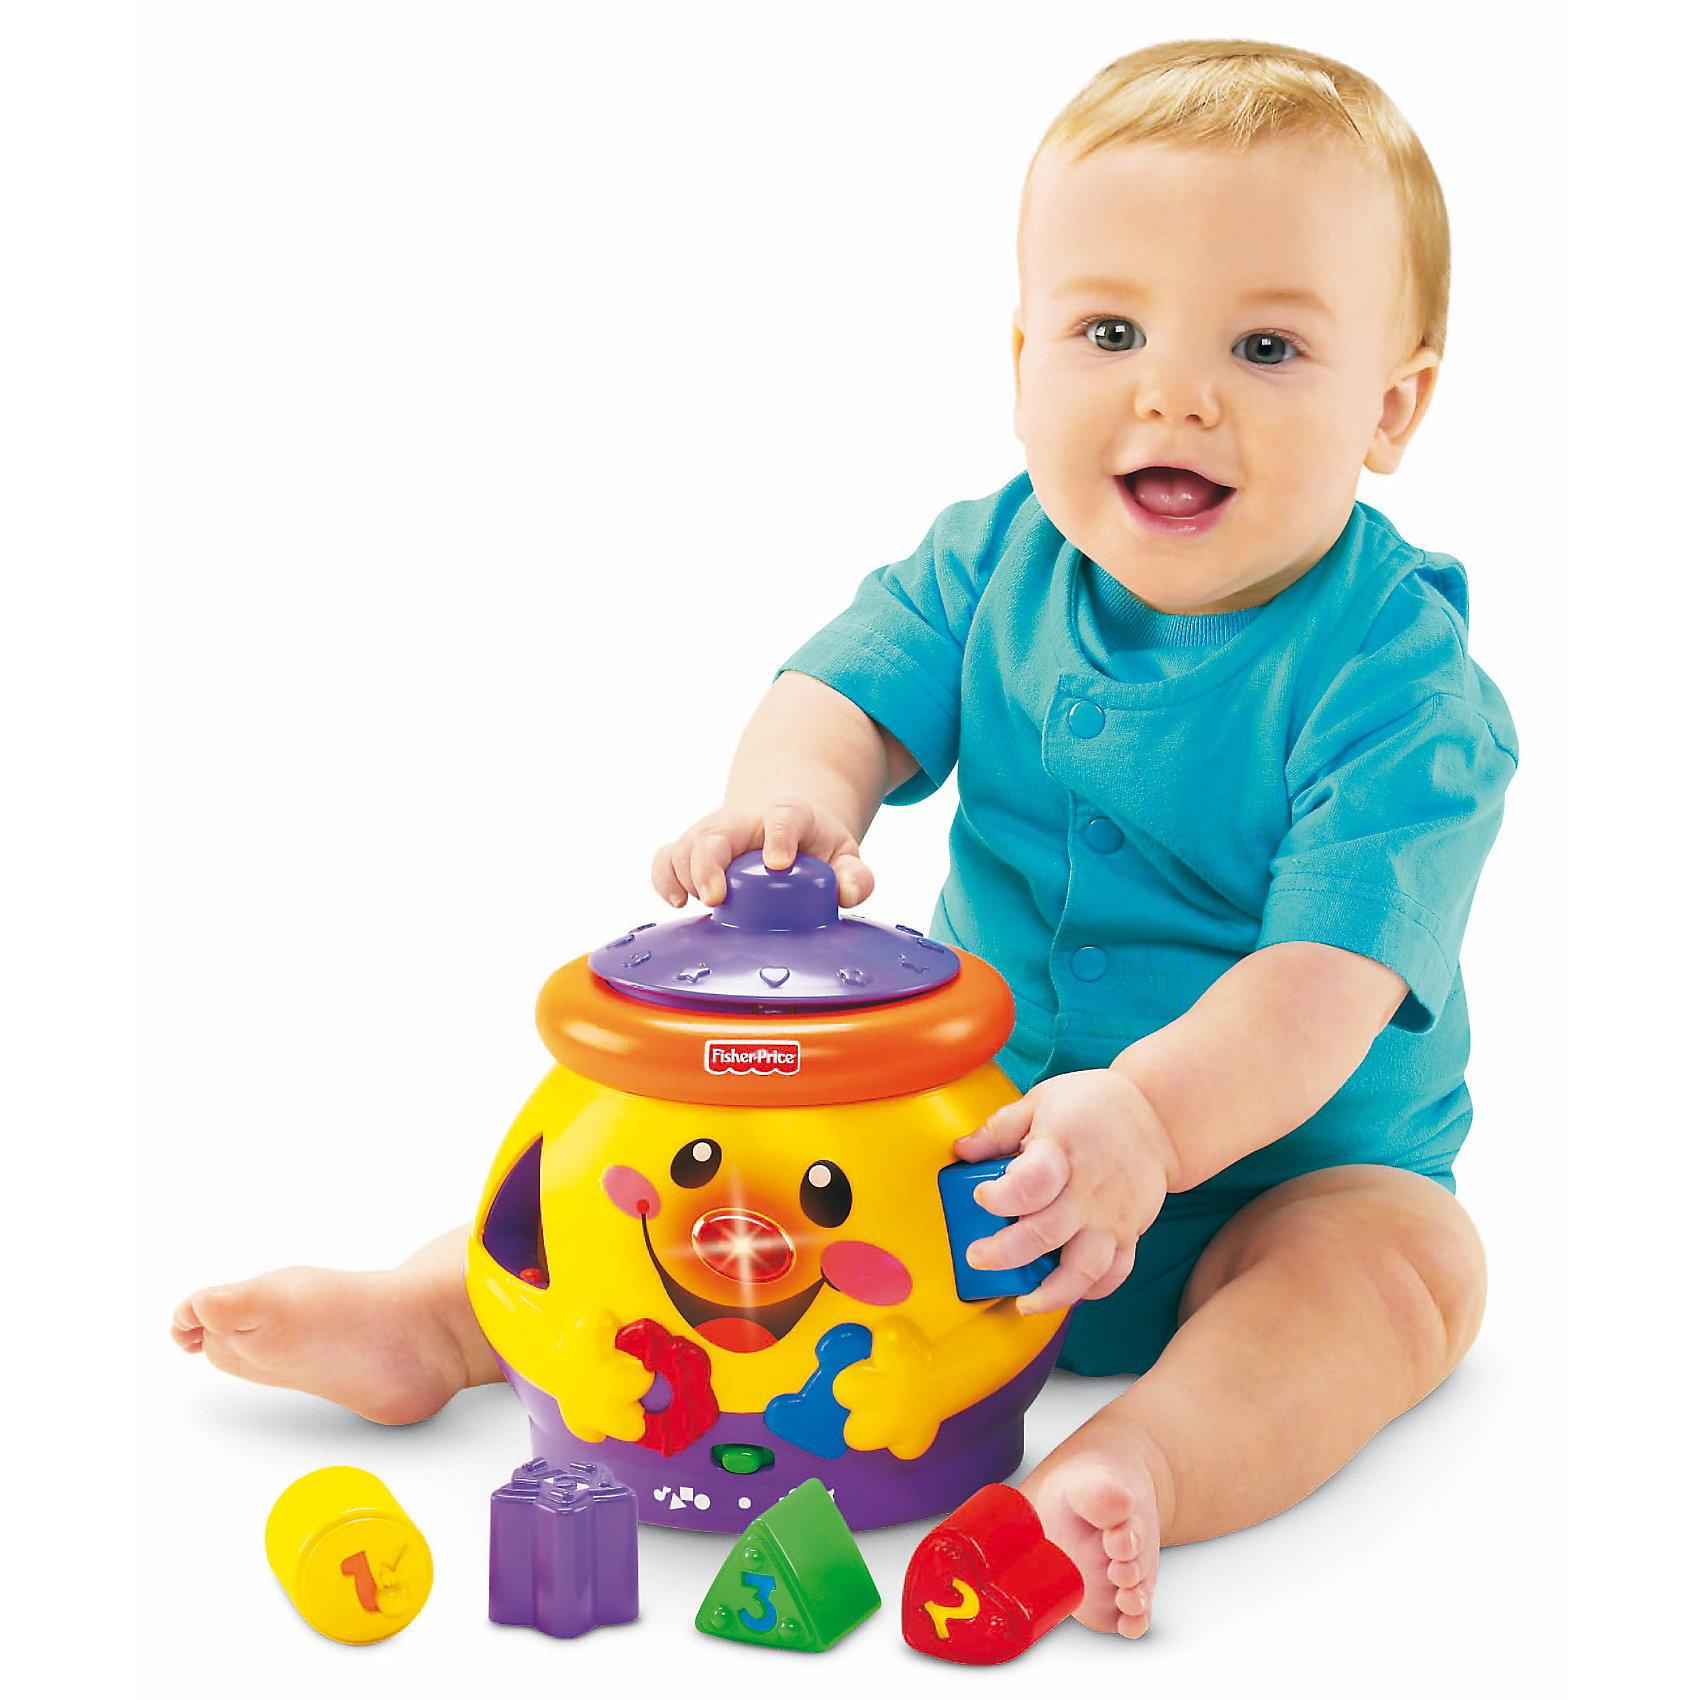 Детские подарки на 4-5 лет